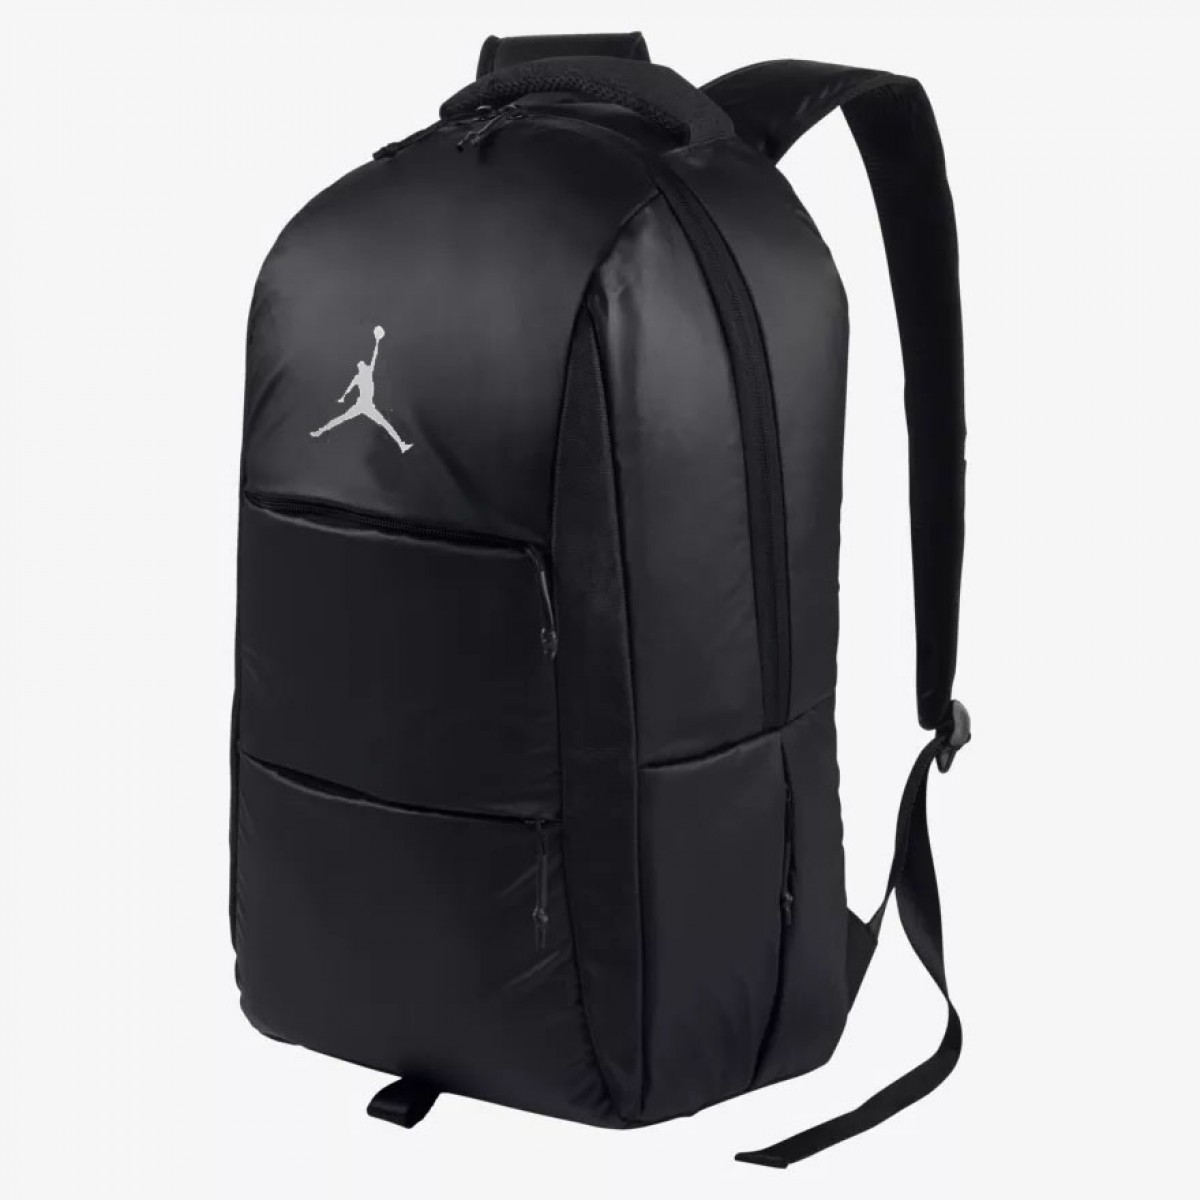 Jordan Alias Backpack 'Black'